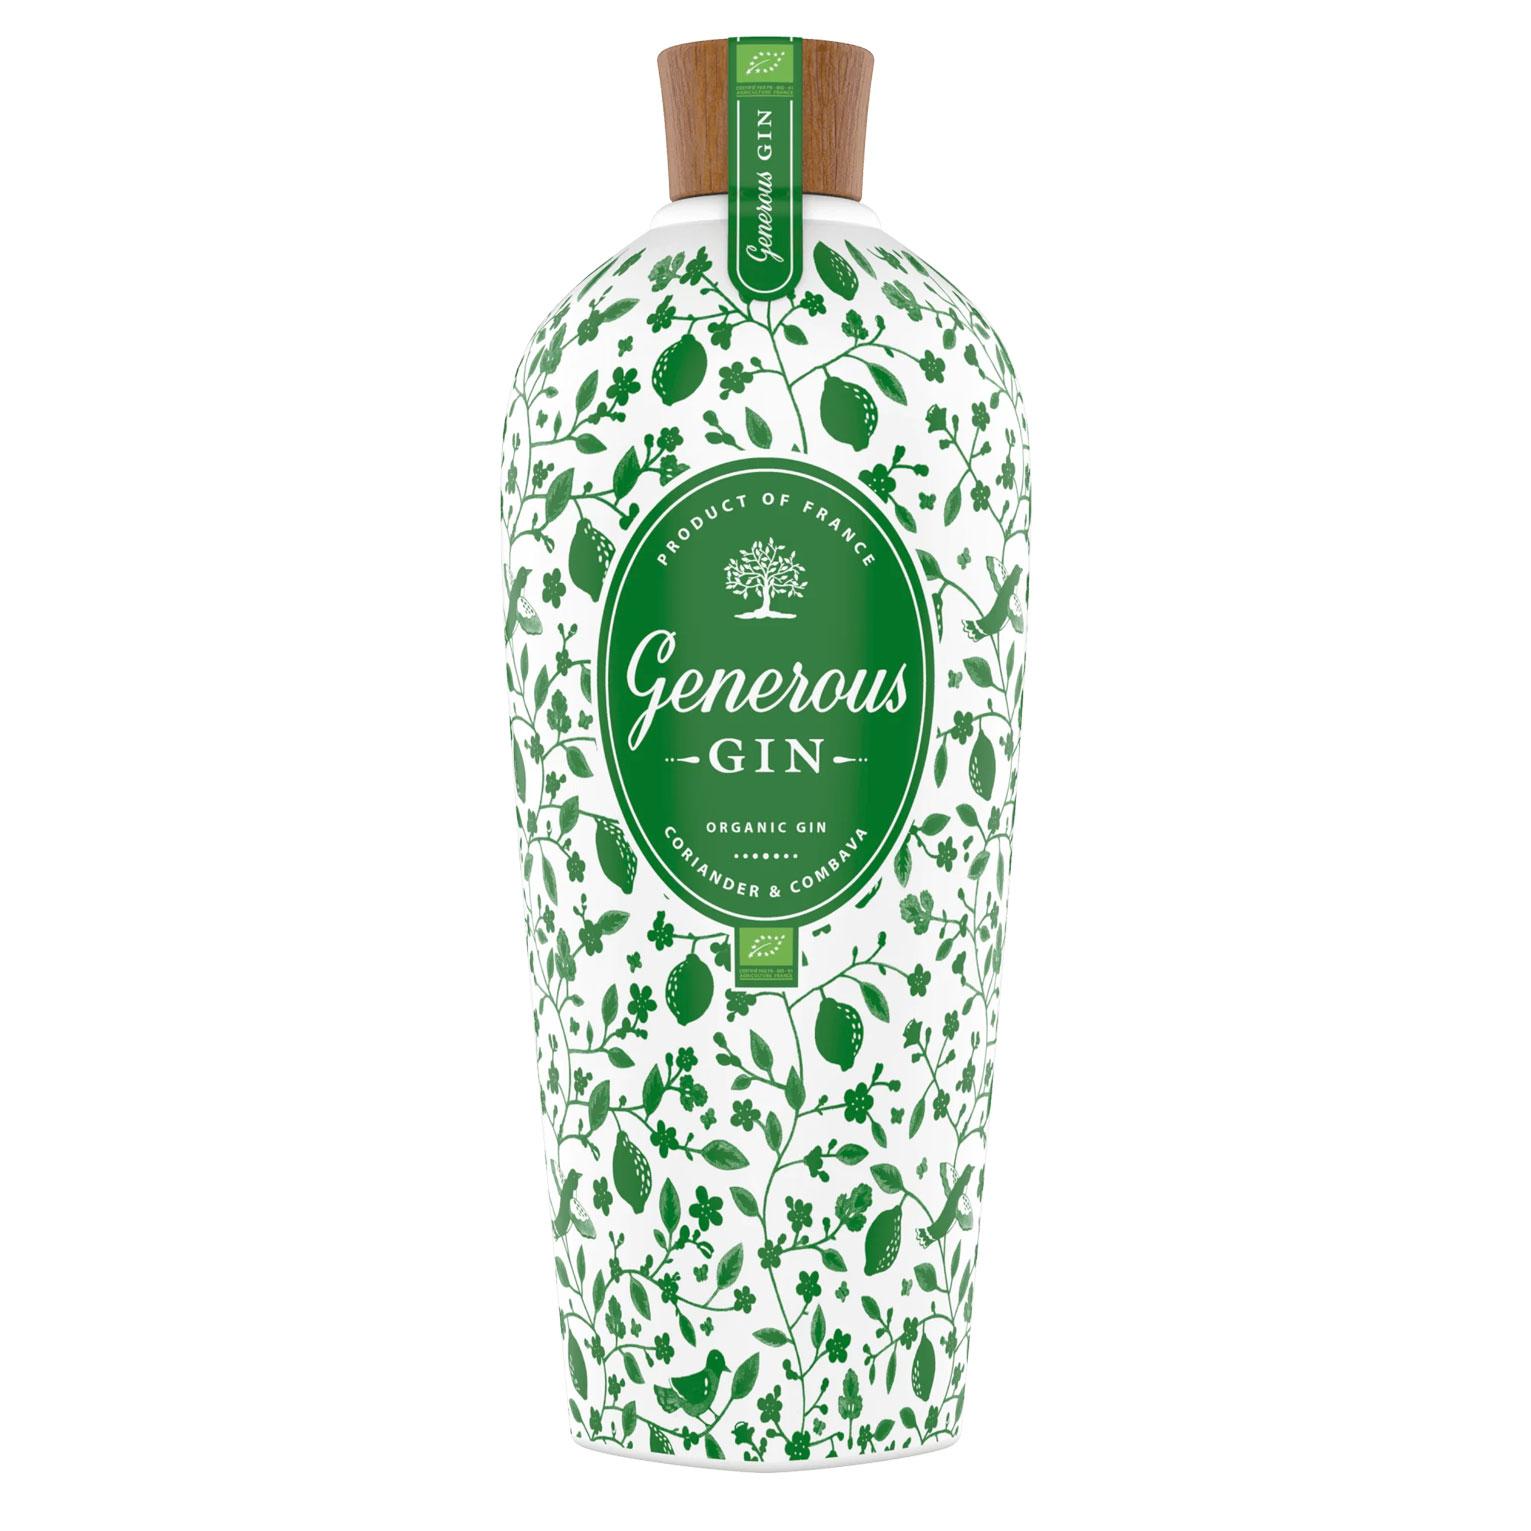 Gin - Generous Gin - Organic - 44° - 70 cl